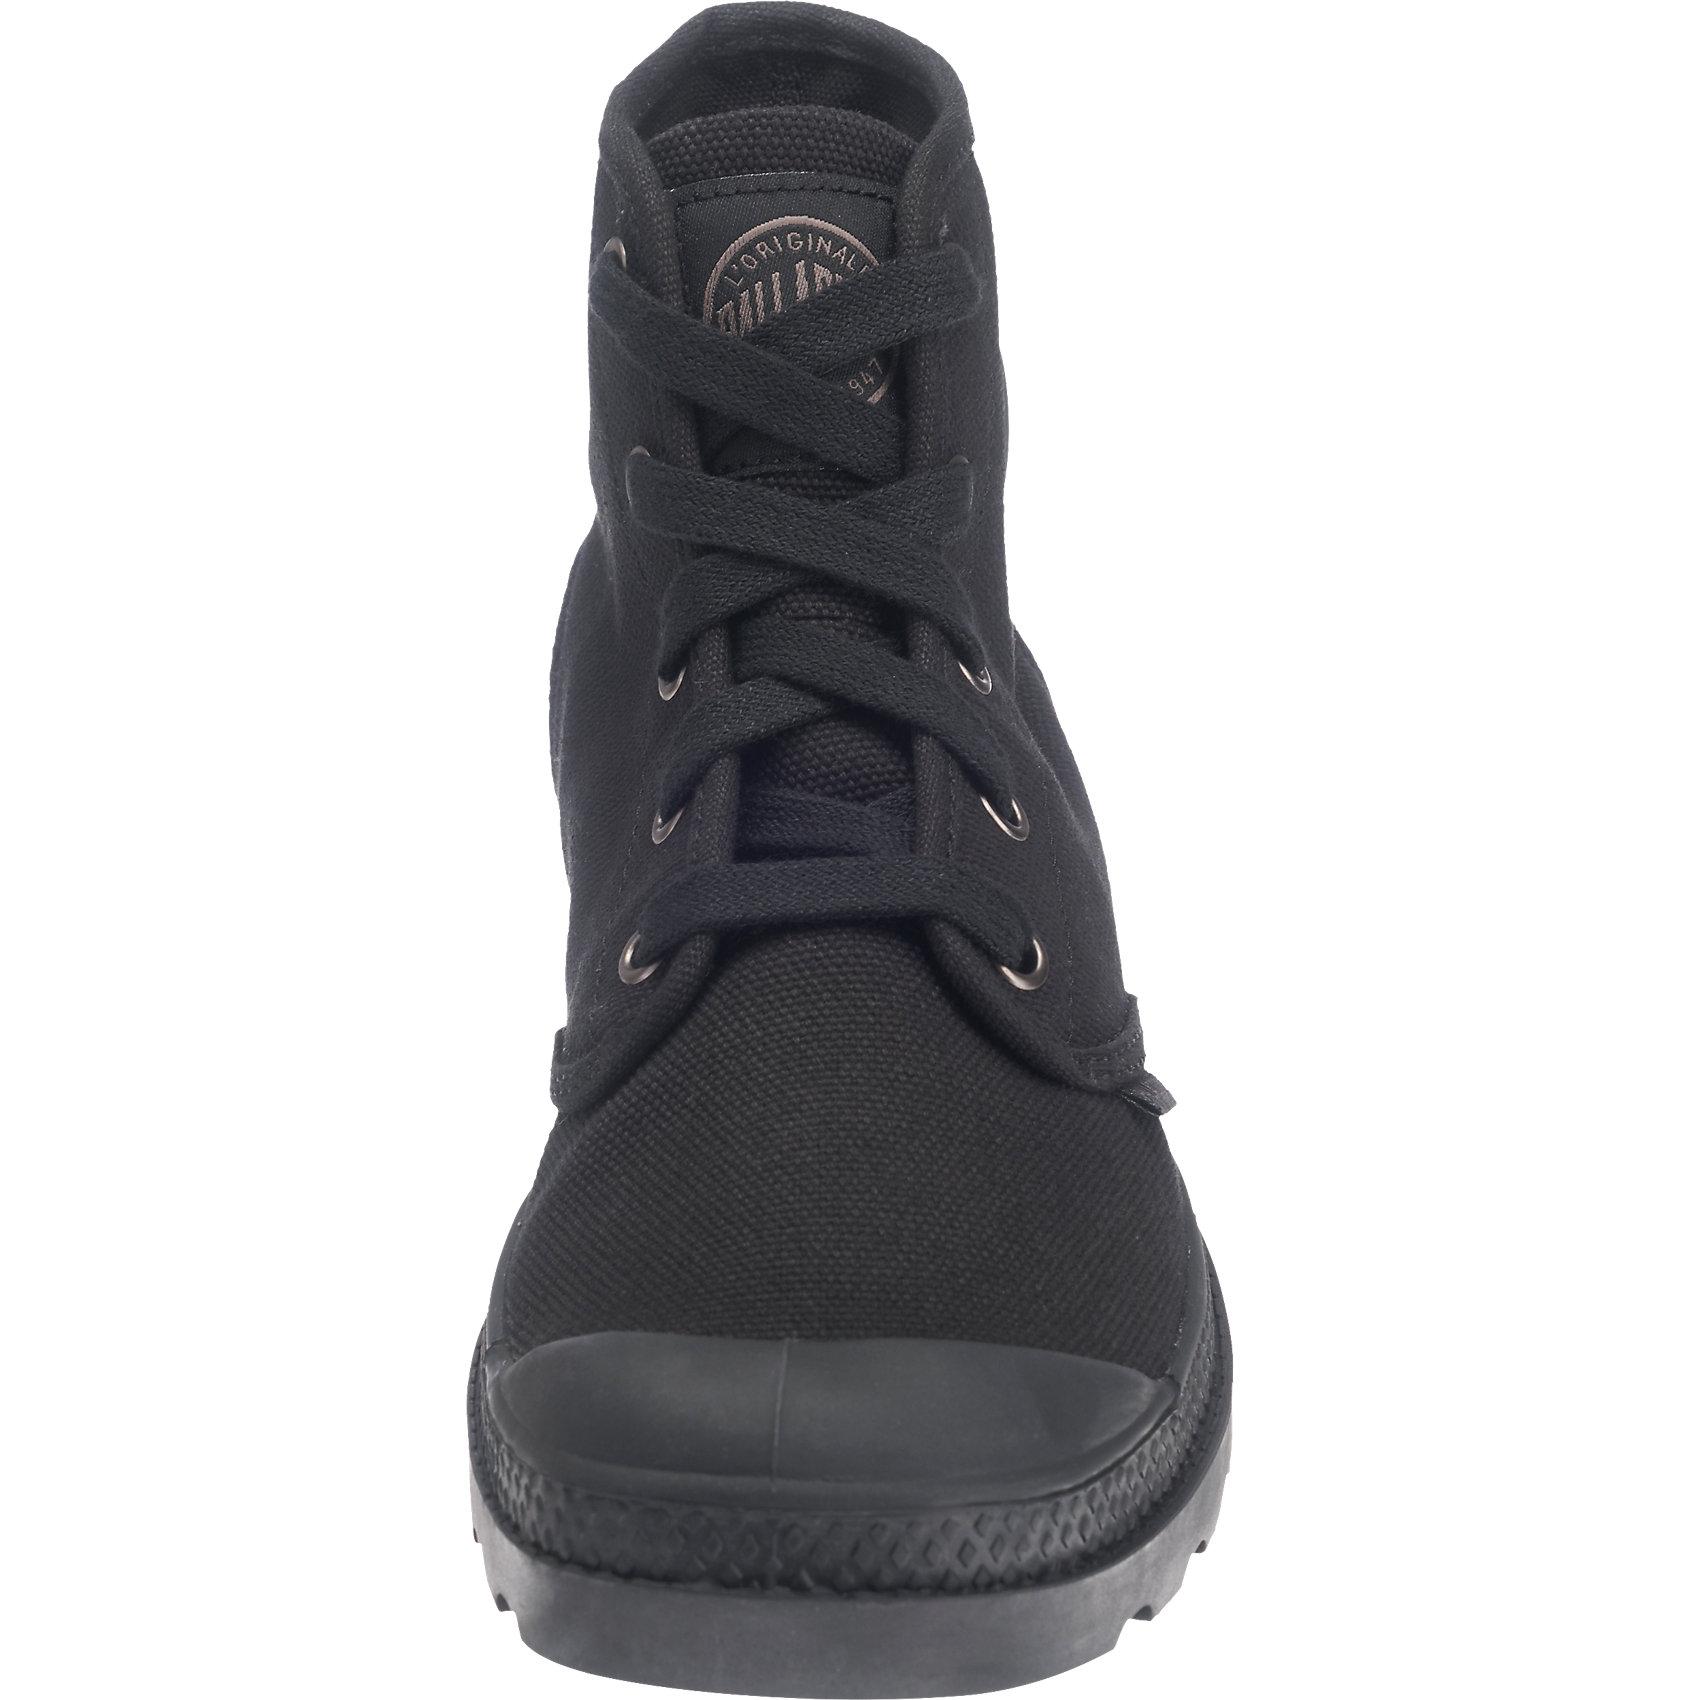 Sneakers Rosa Schwarz 5761713 Palladium Pampa Beige Neu Hi BqxYtP4nwH